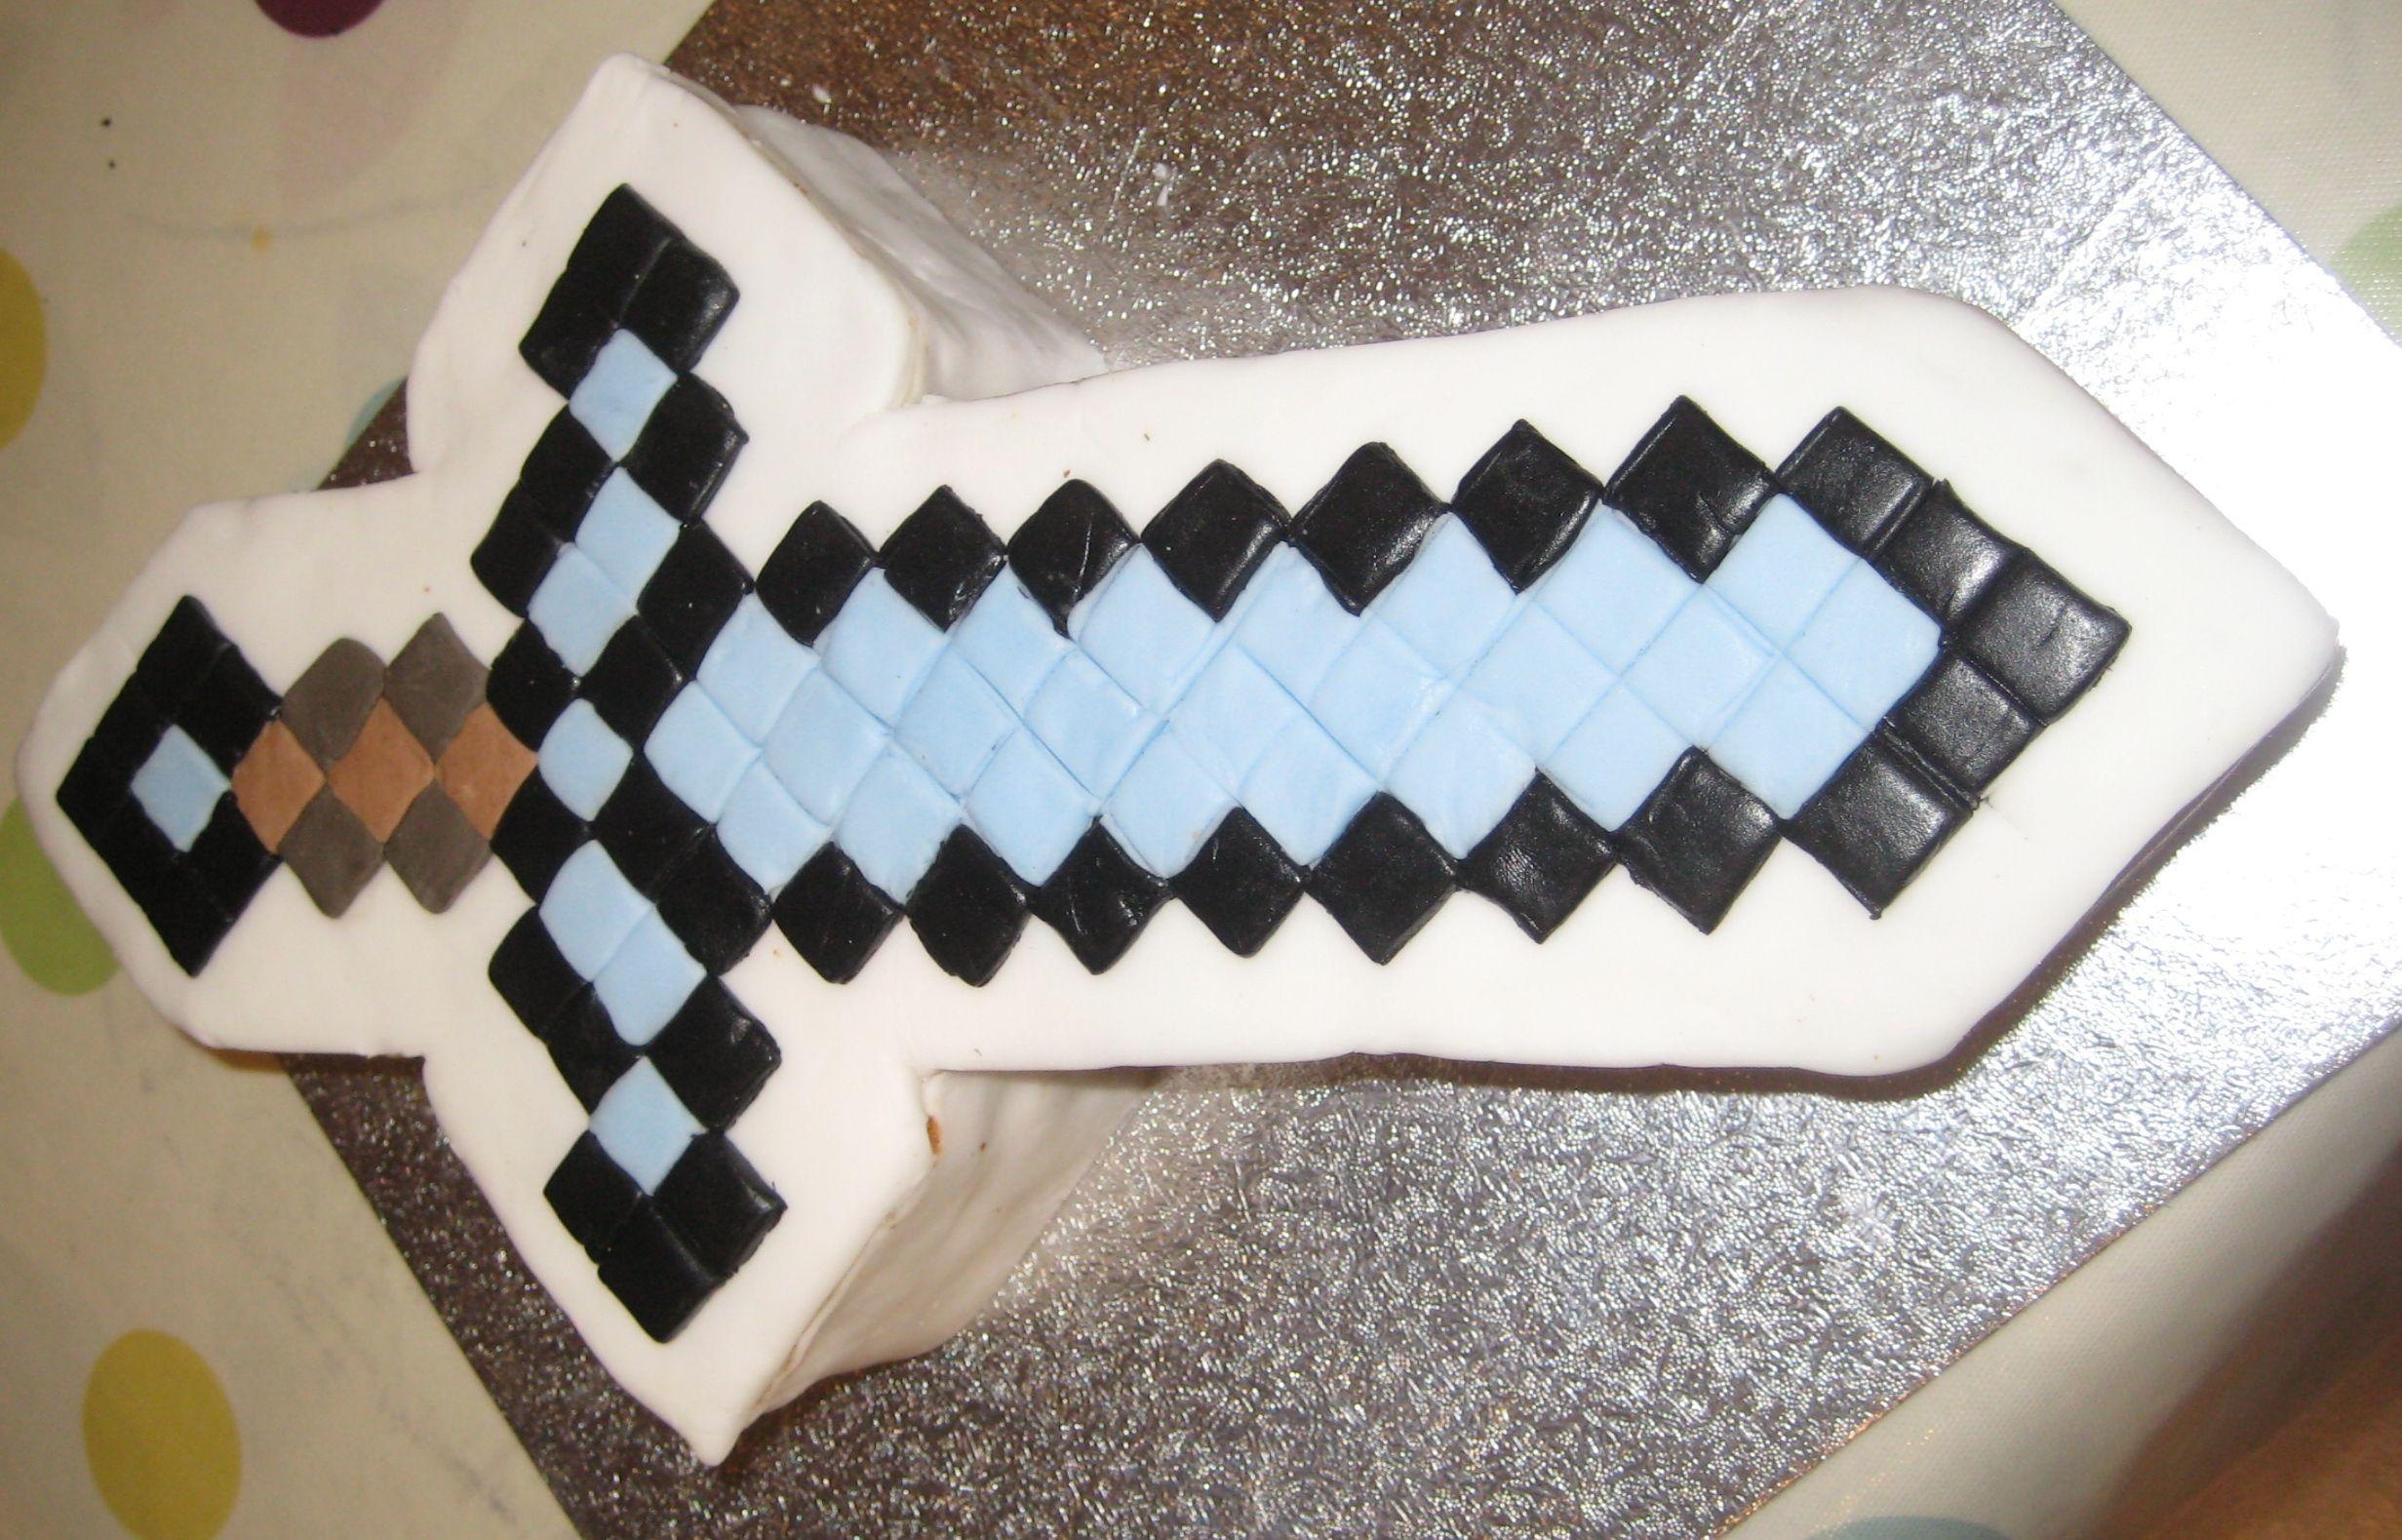 Minecraft diamond sword cake for birthday cakes ...